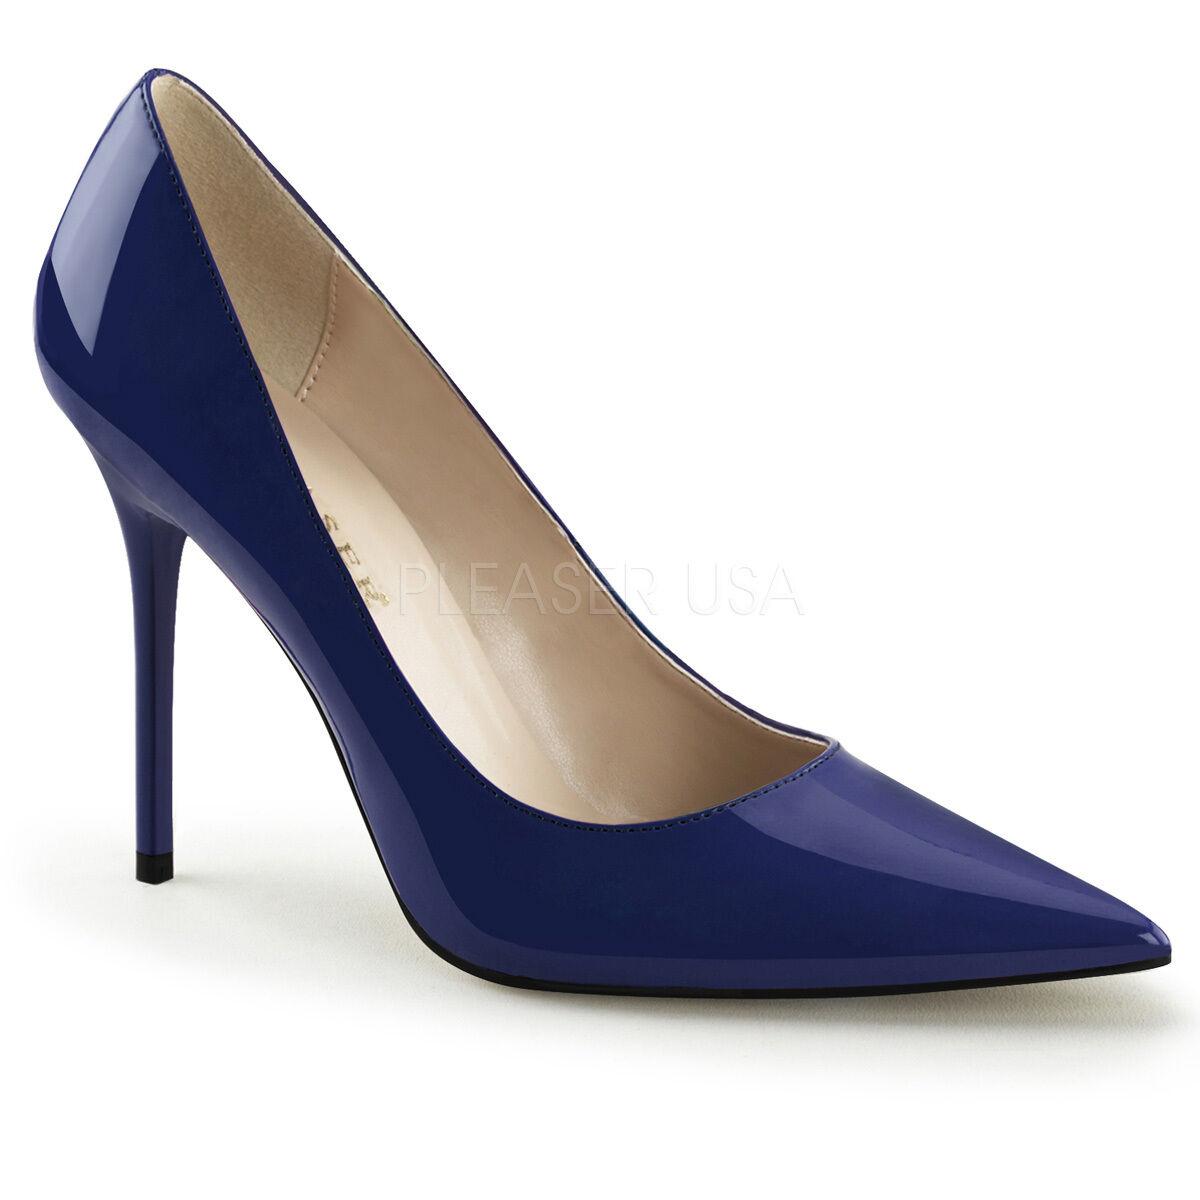 PLEASER CLASSIQUE-20 NAVY BLUE PATENT CLASSIC STILETTO HEEL COURT Schuhe